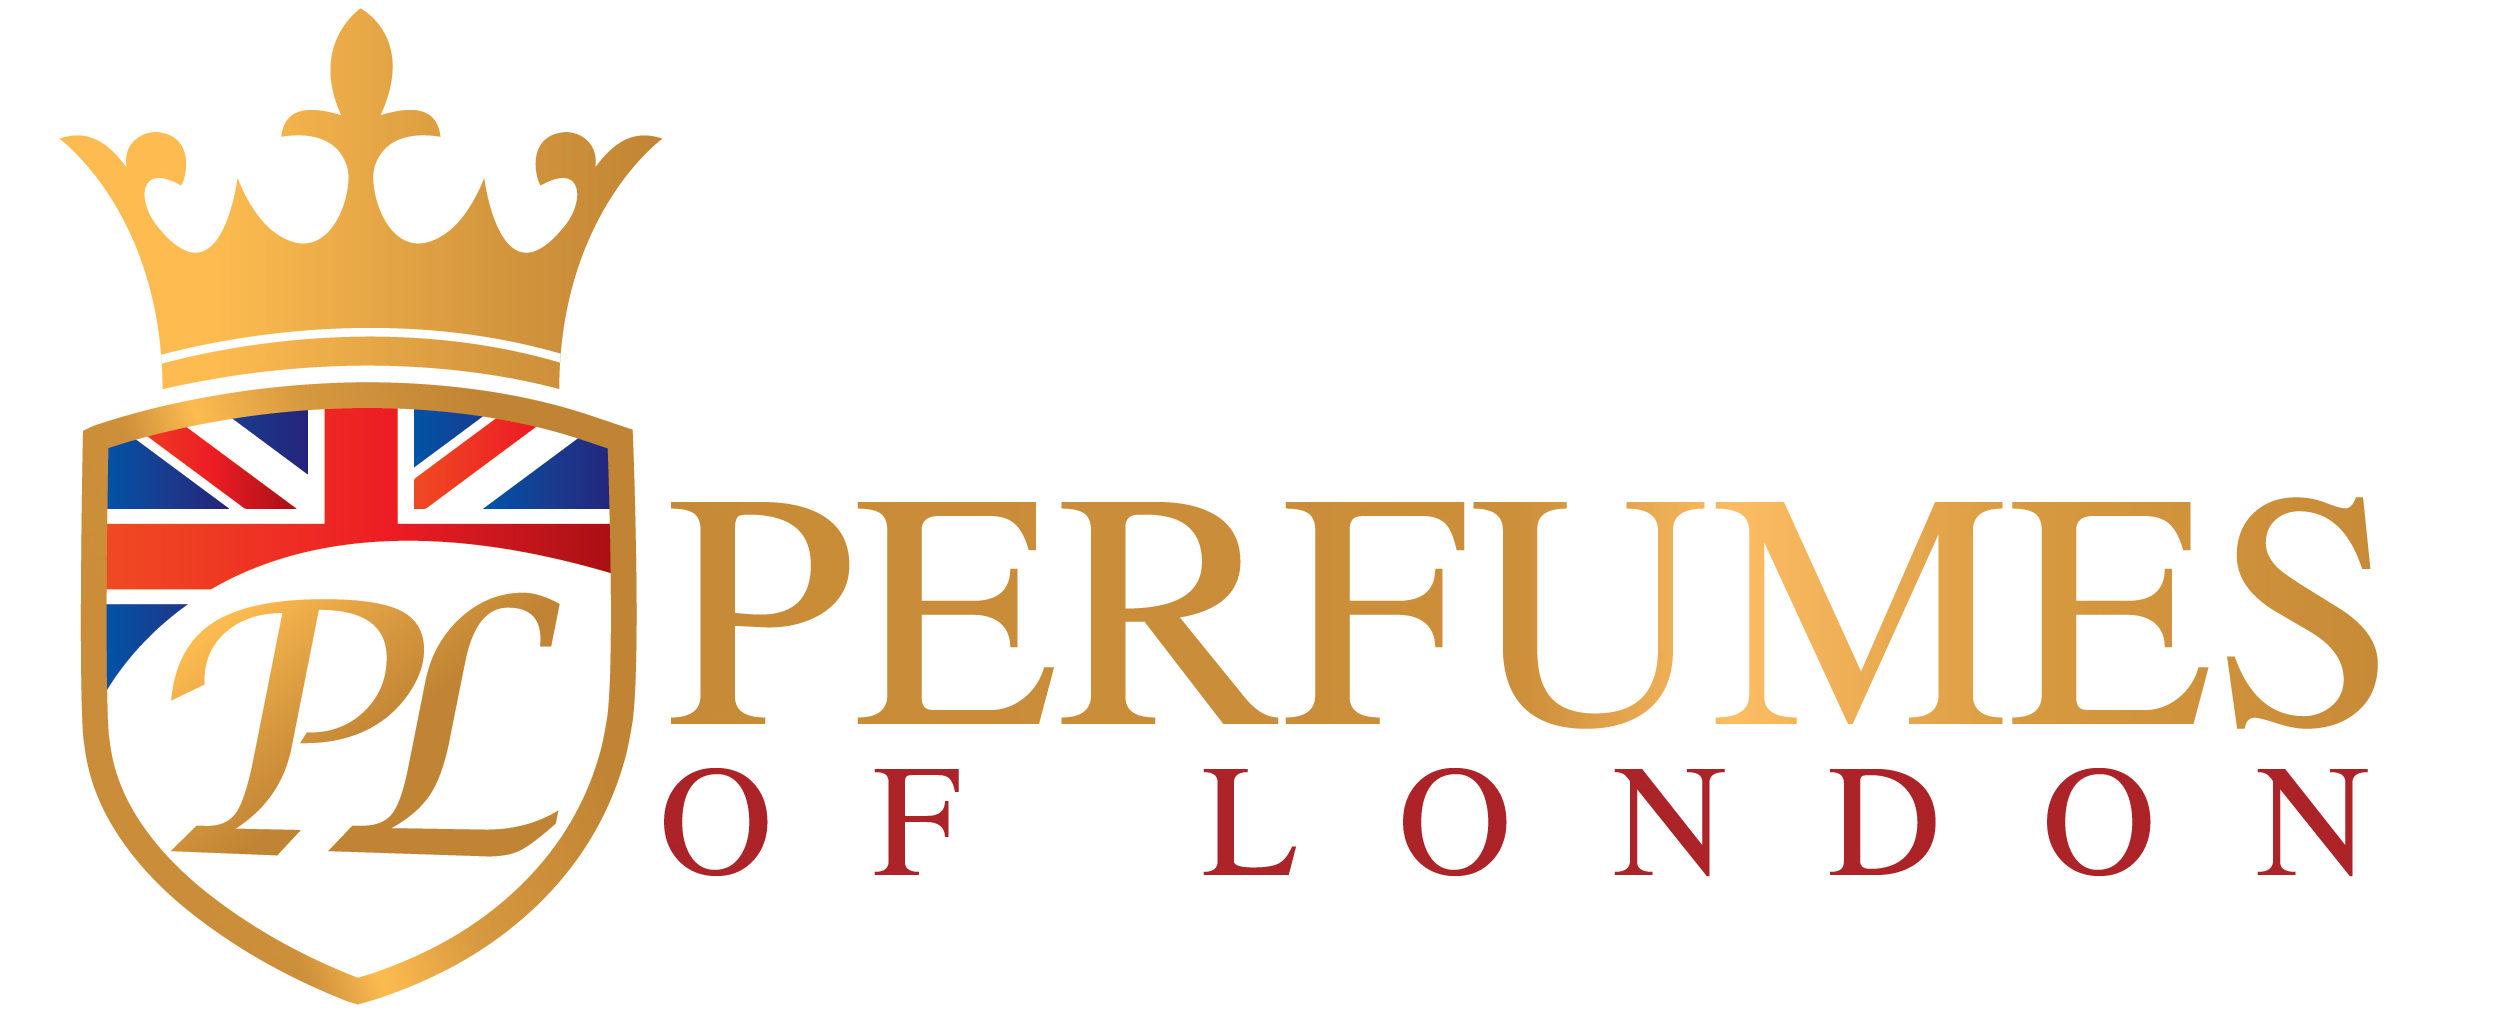 Perfumes of London